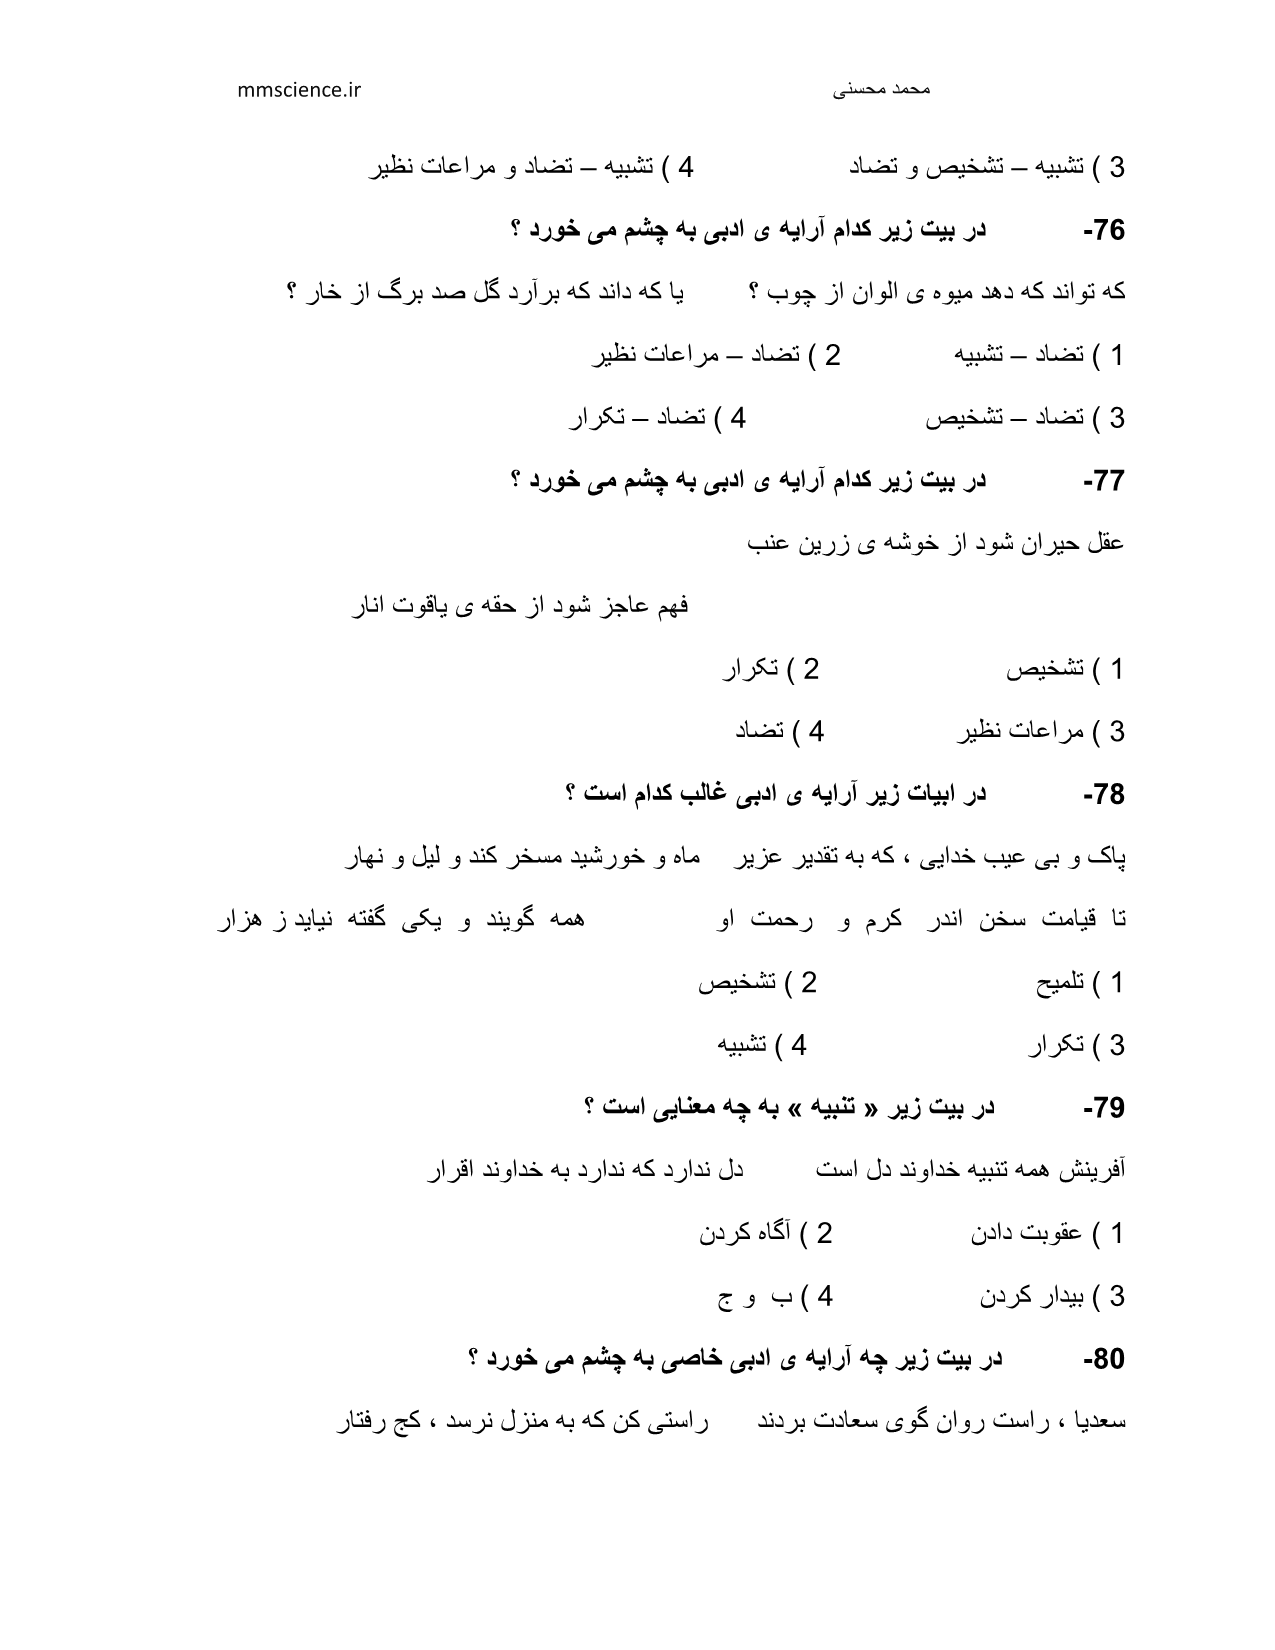 نمونه سوال تیزهوشان فارسی نهم